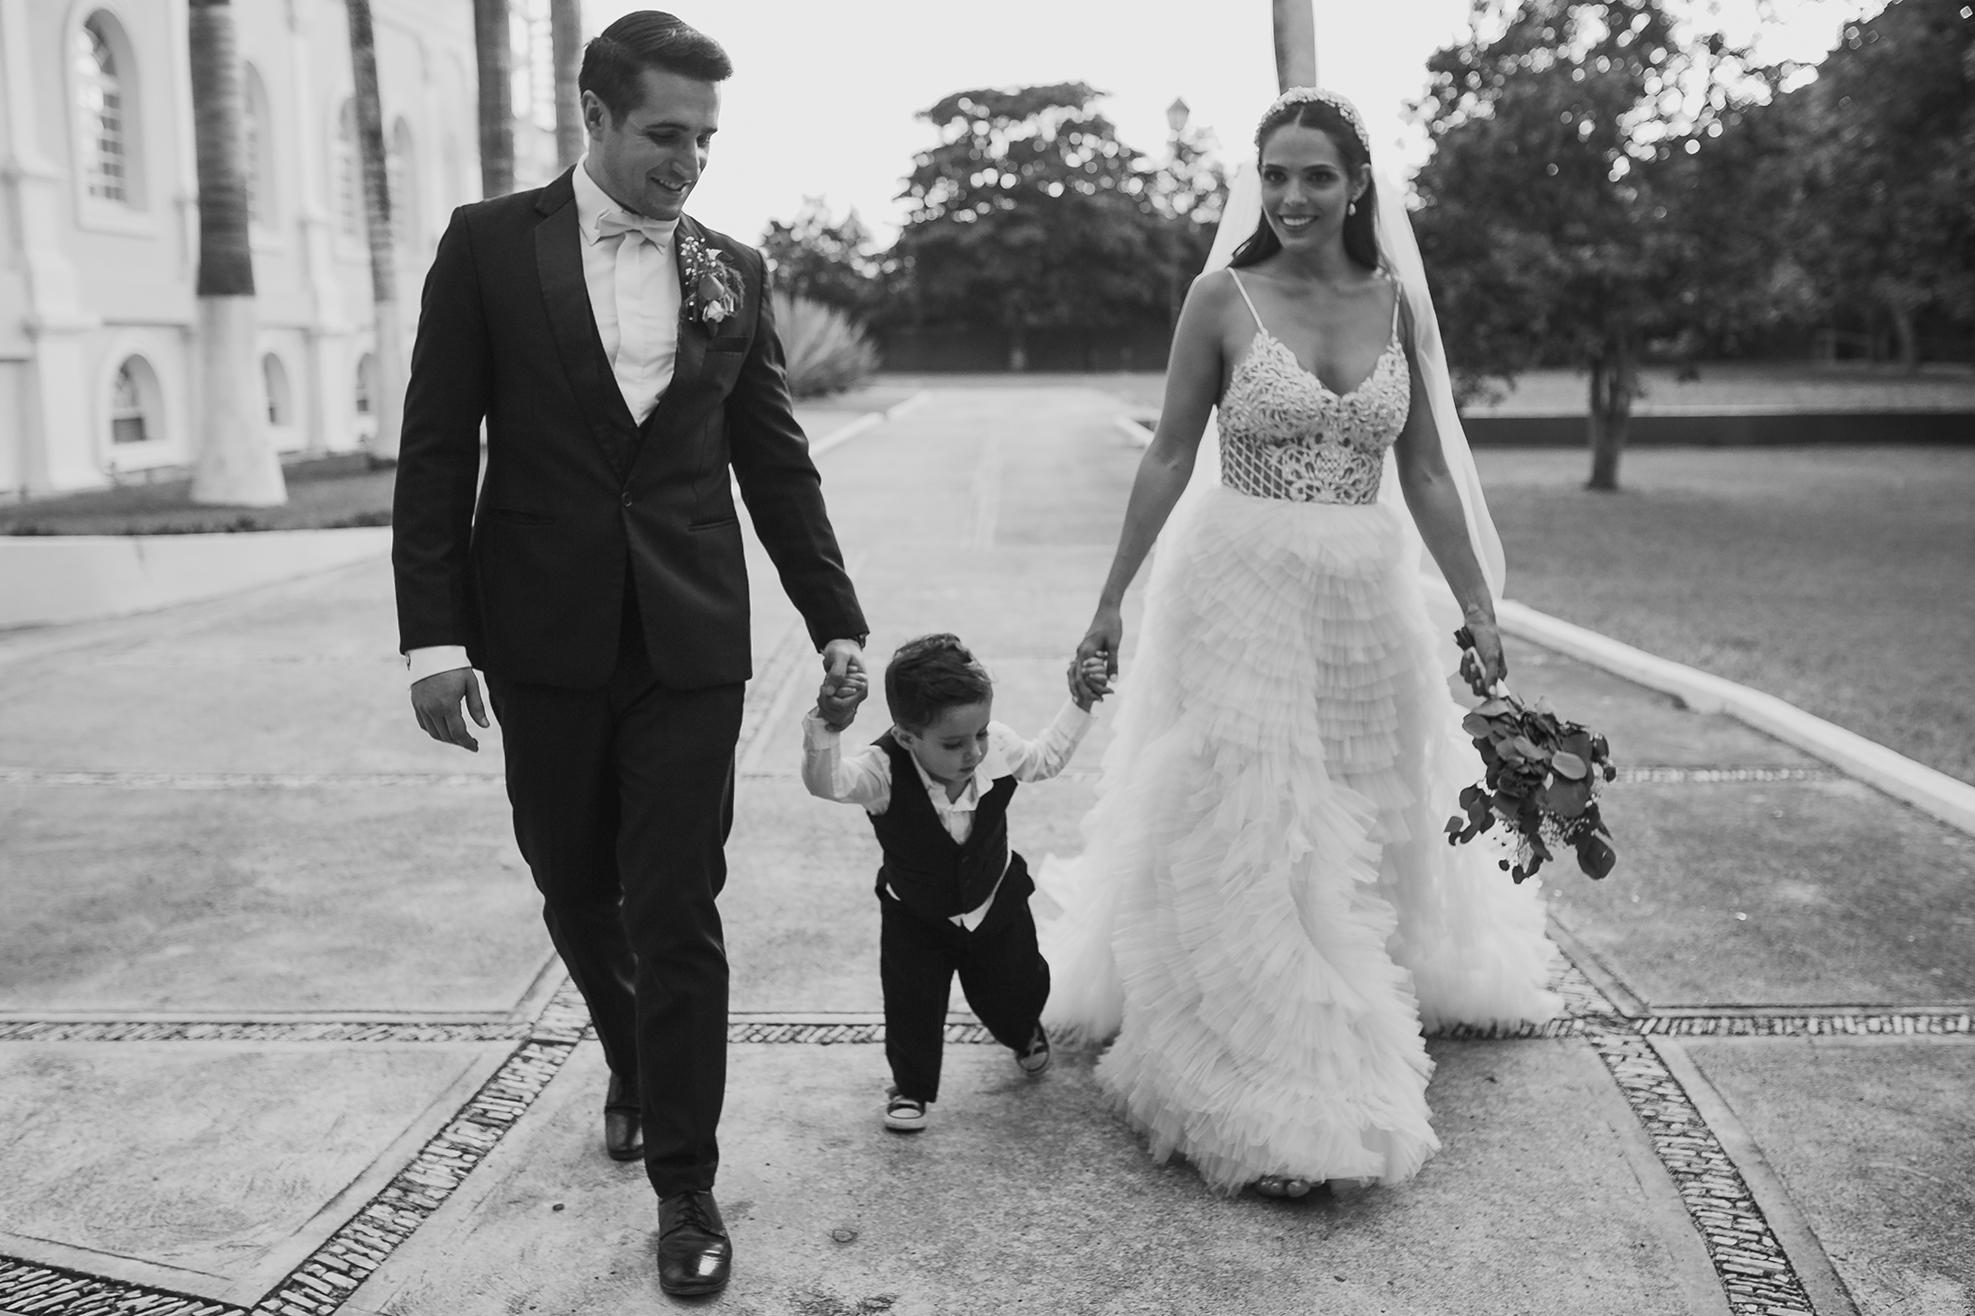 0868R&F__WeddingDestination_Weddingmerida_BodaMexico_FotografoDeBodas_FabrizioSimoneenFotografo.jpg